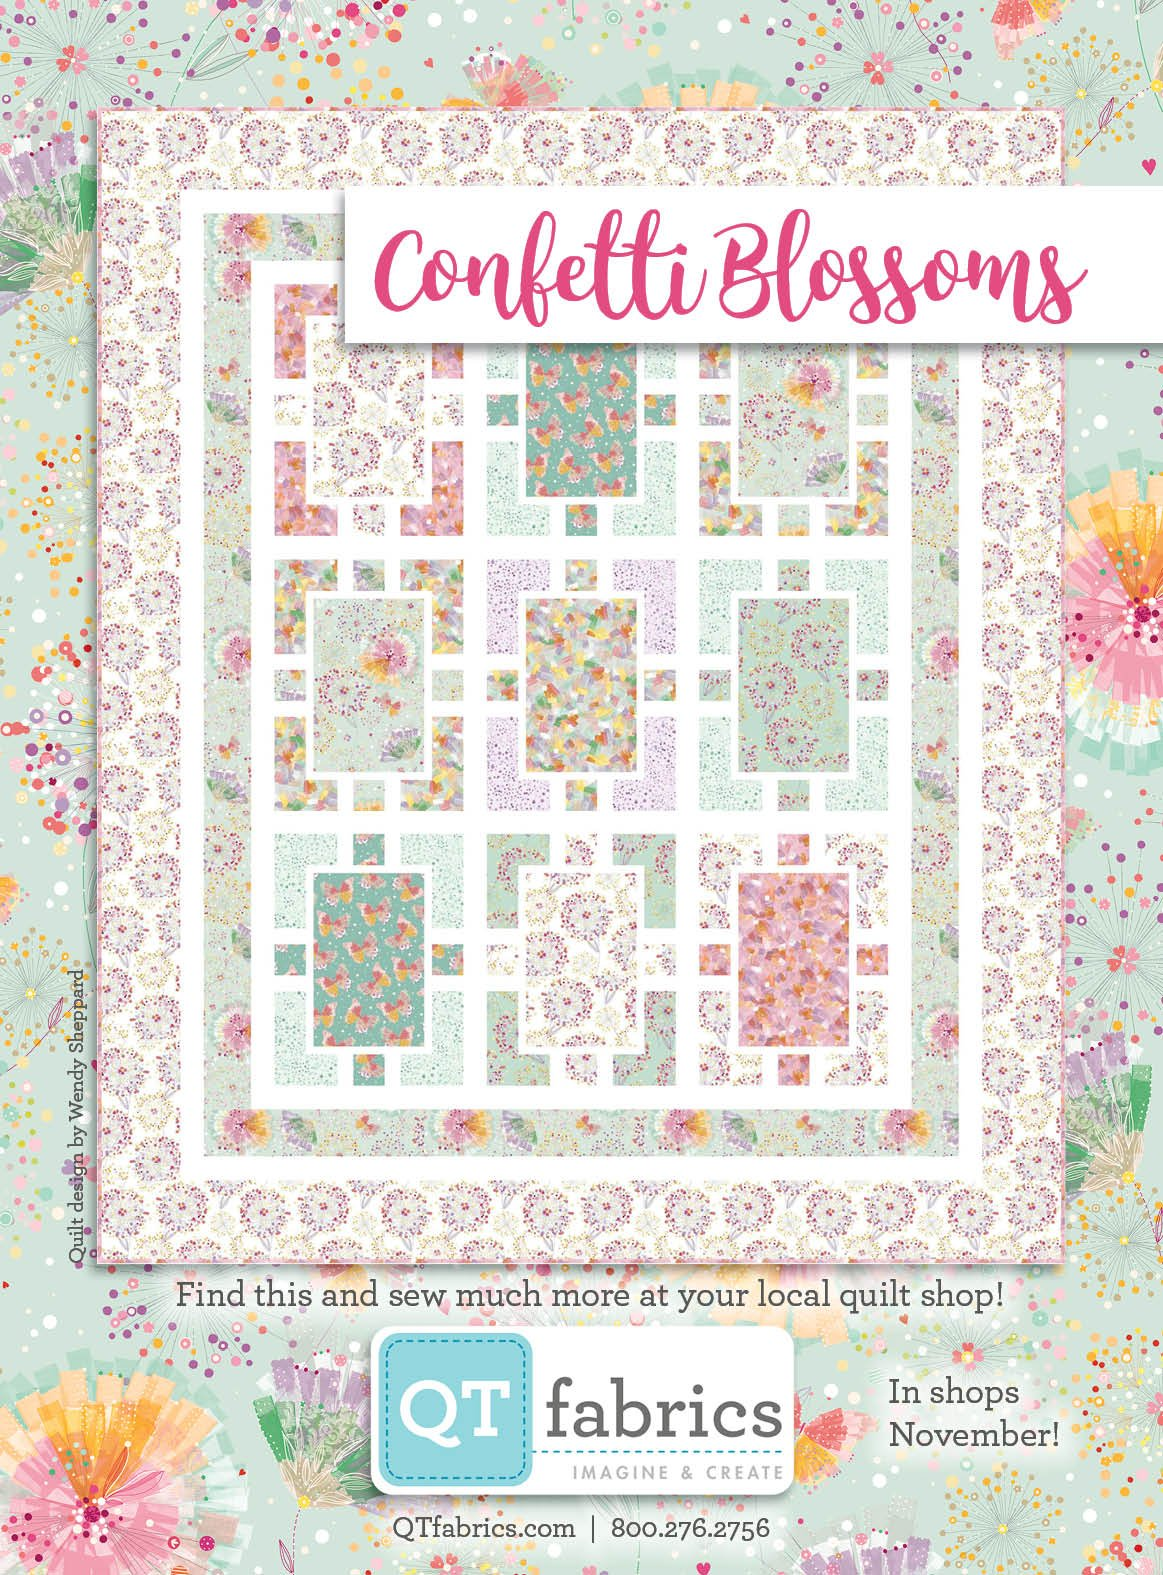 Q - Confetti Blossoms Quilt Kit